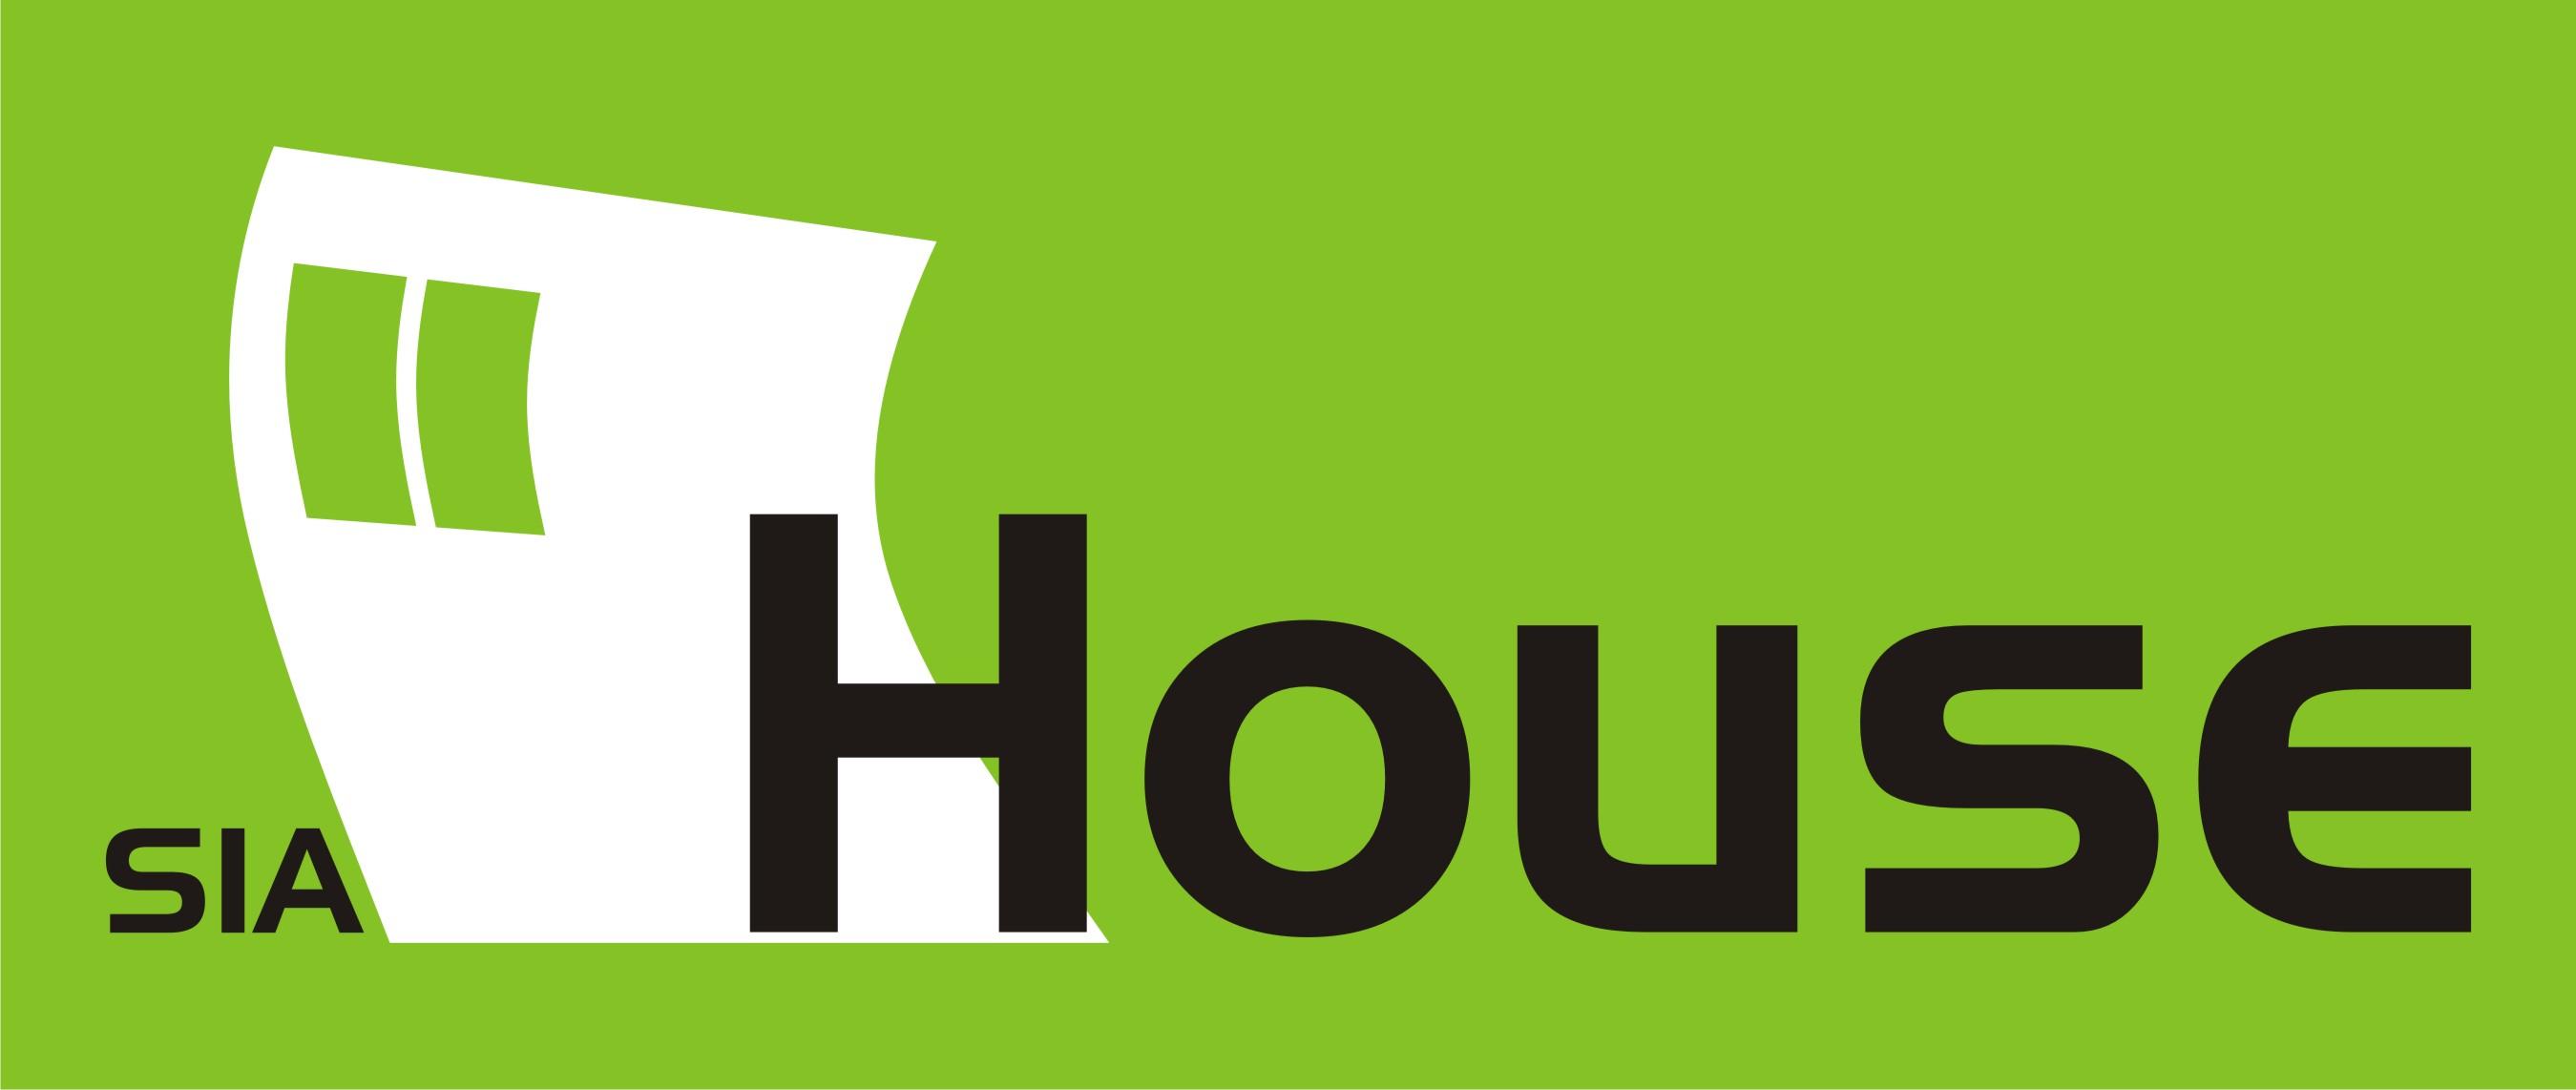 Sia House